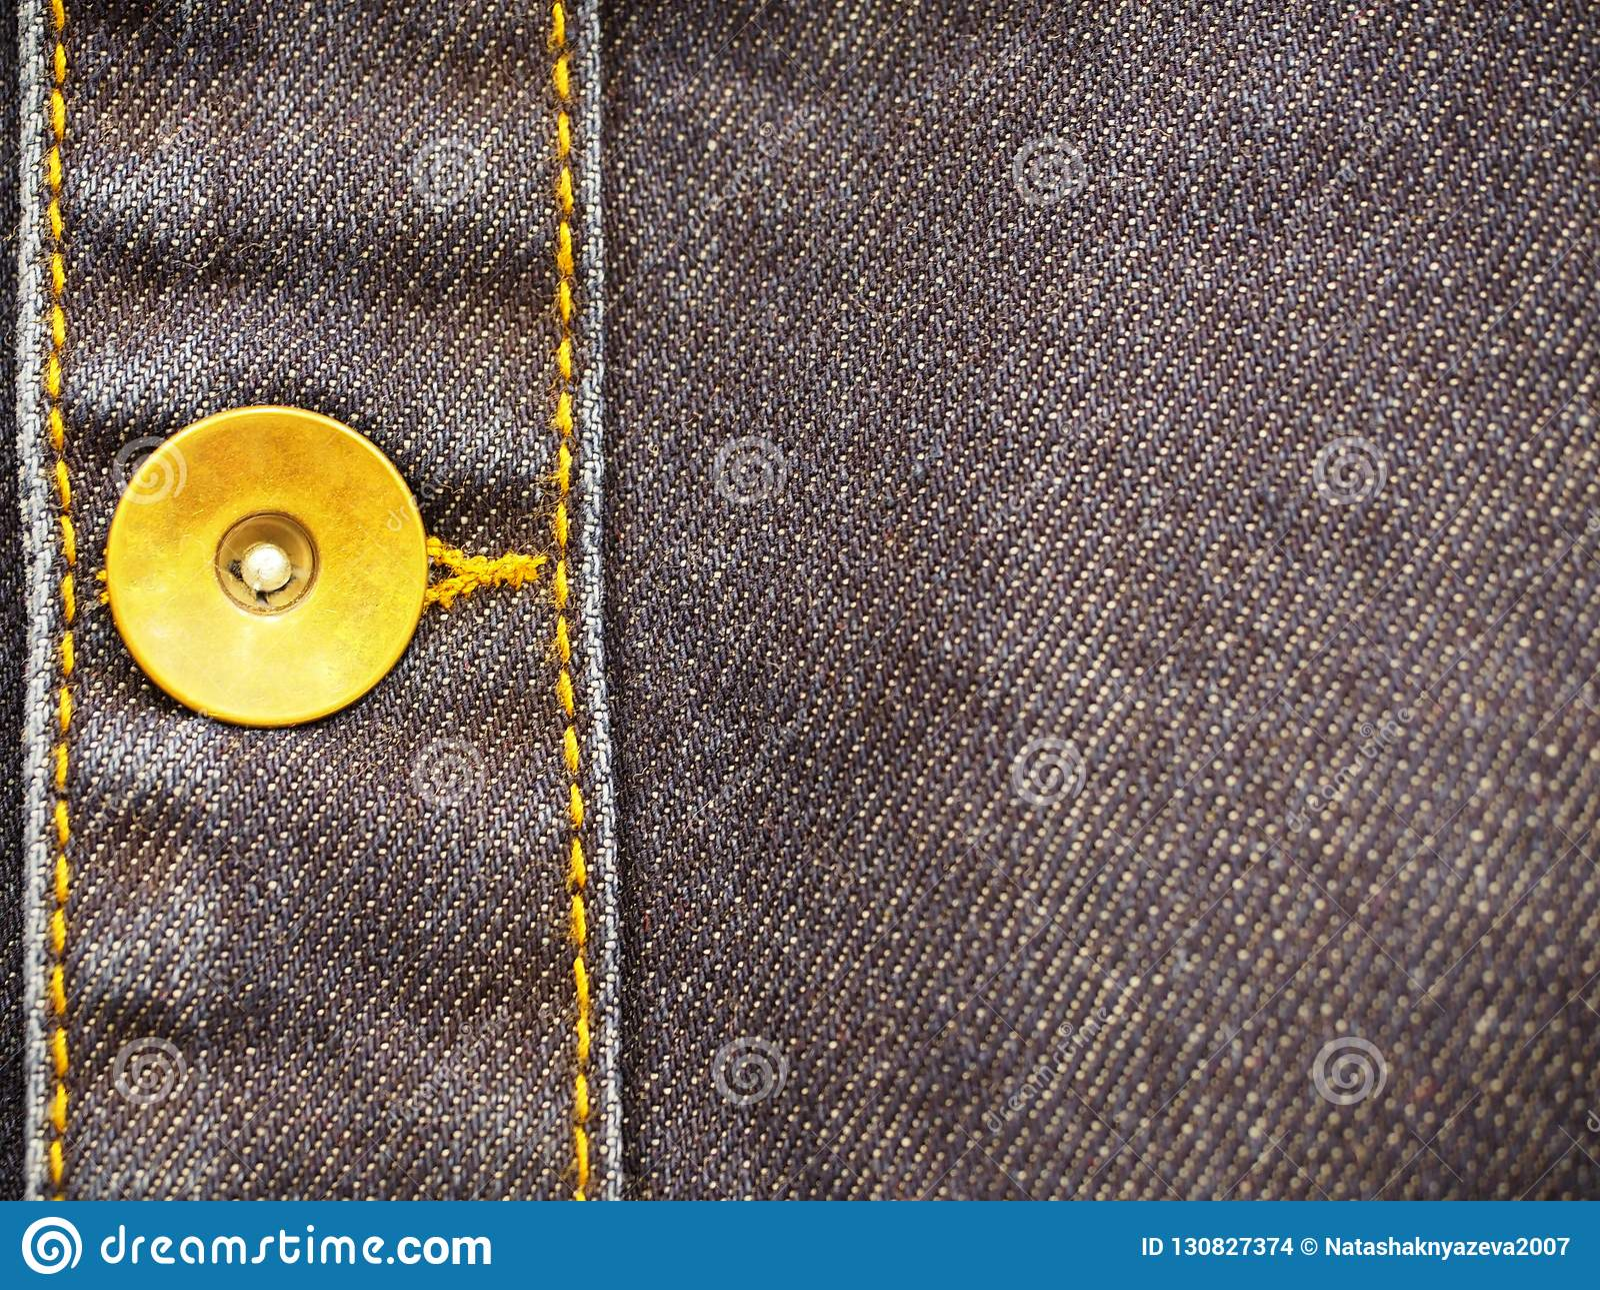 Denimpunt met knoopclose-up, als achtergrond